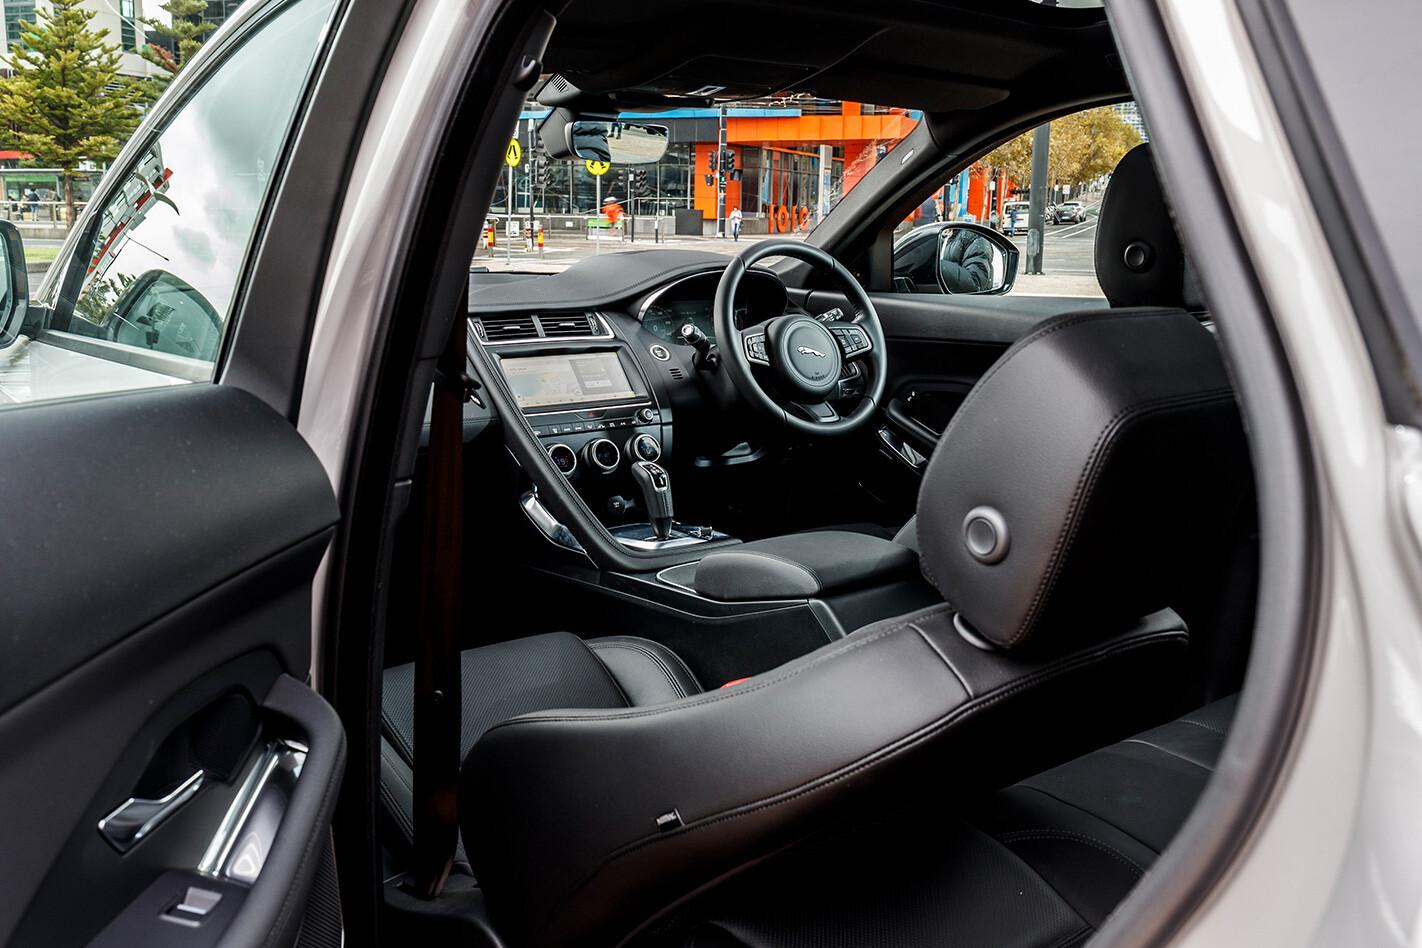 Jaguar Interior Jpg